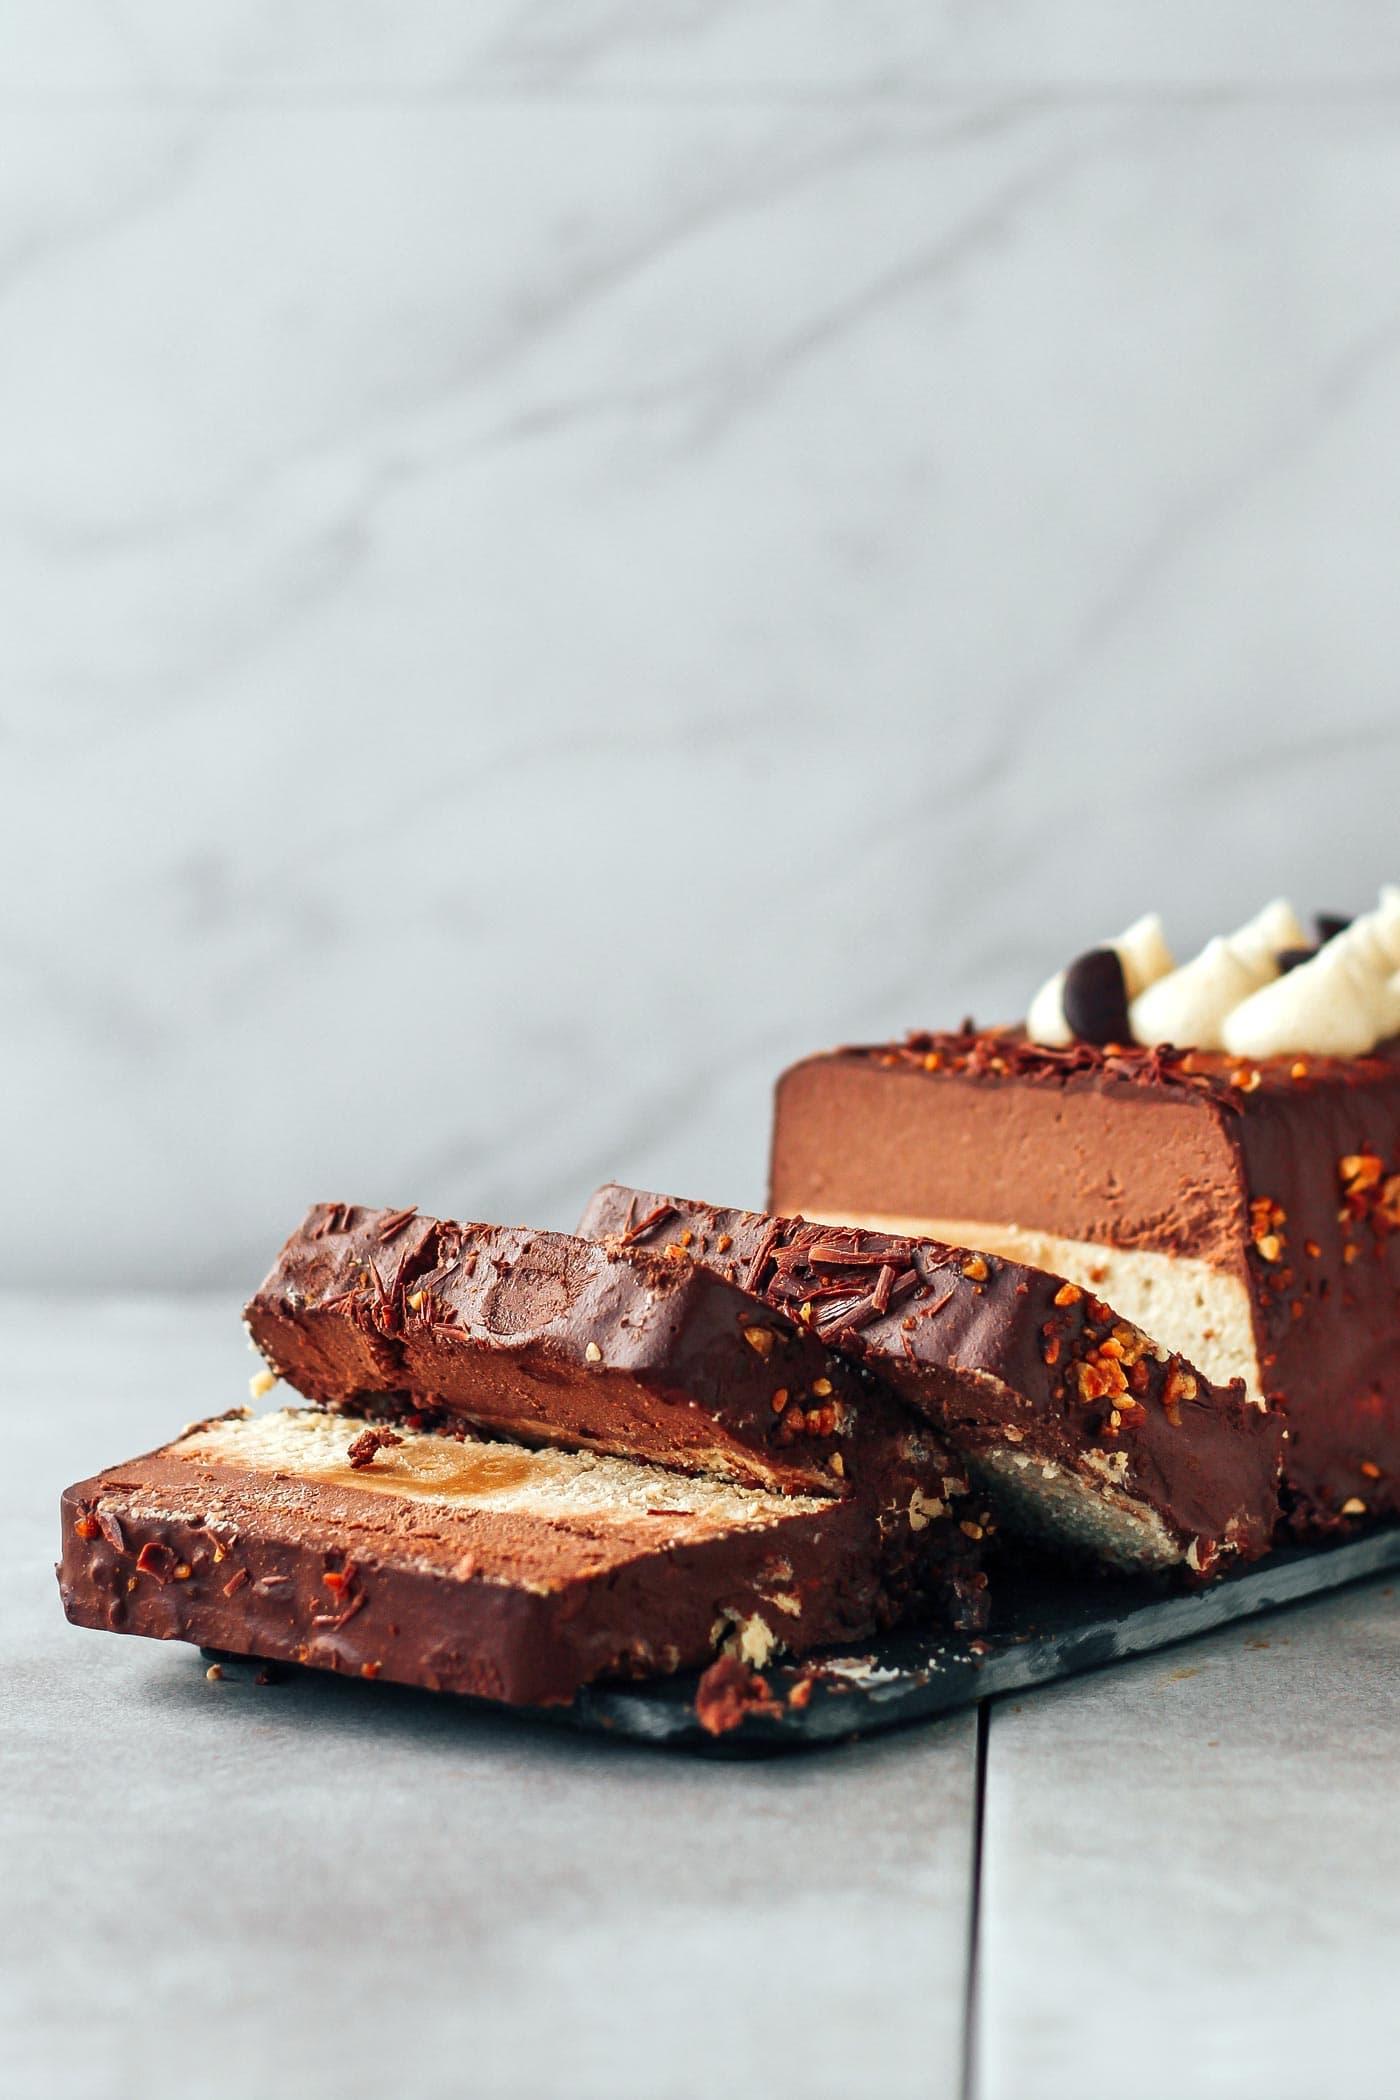 Chocolate, Caramel, and Vanilla Yule Log (Vegan + GF)